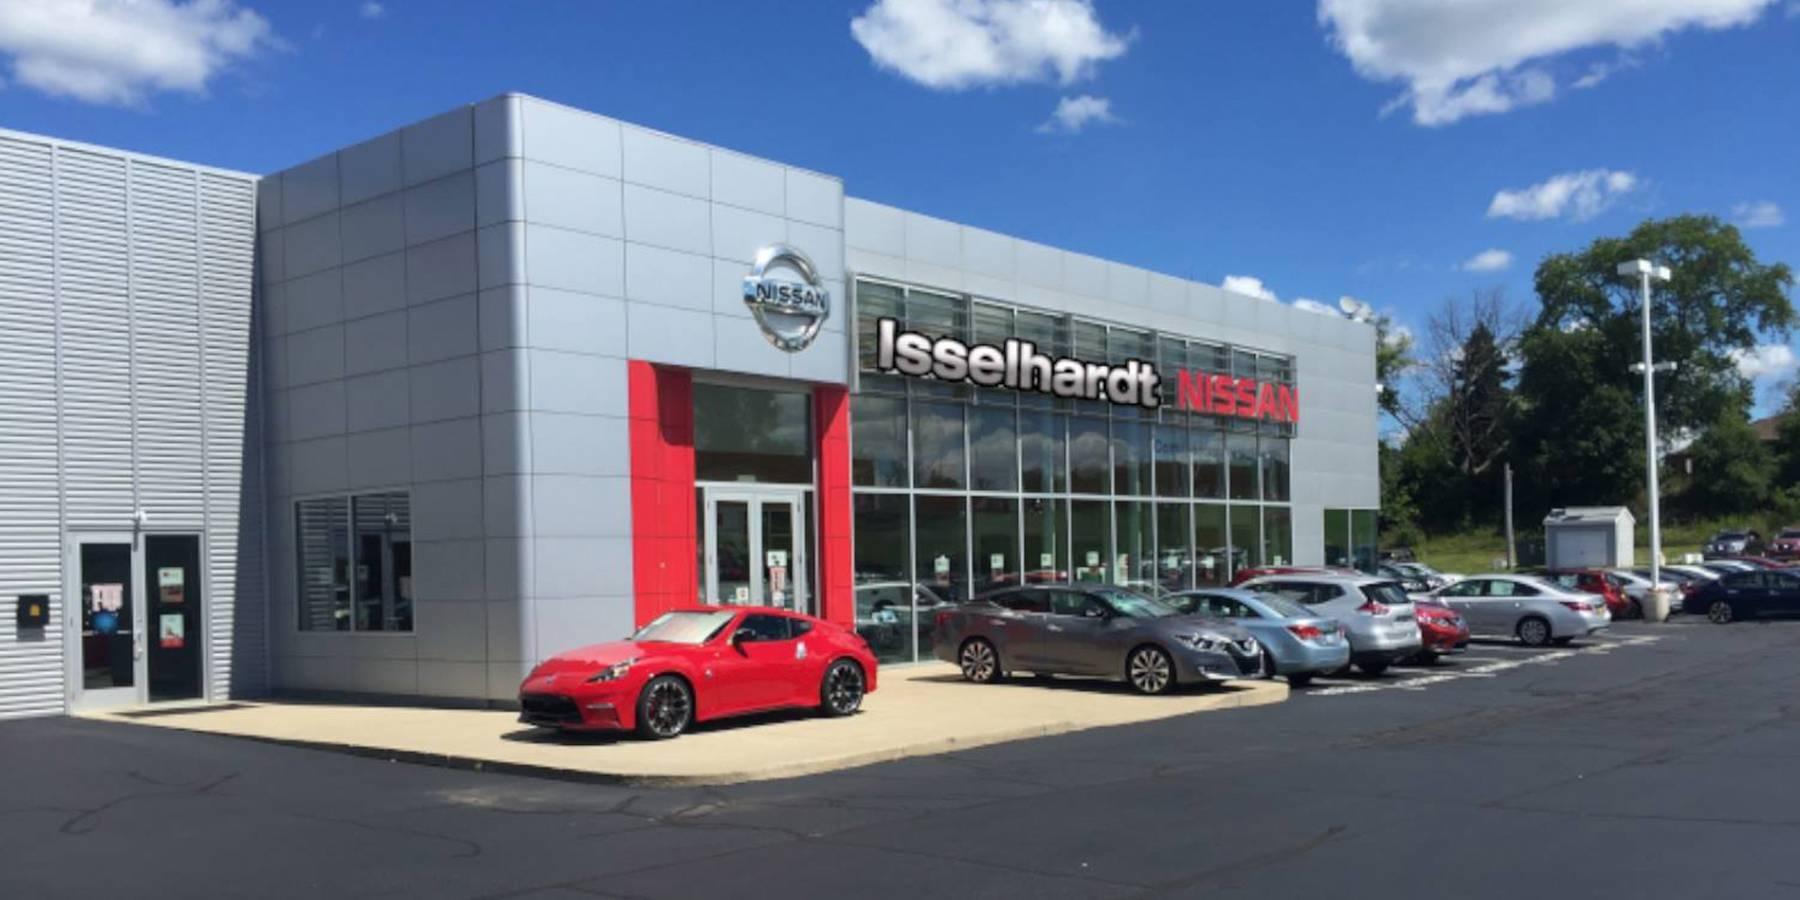 Used Car Dealership In Jackson Mi